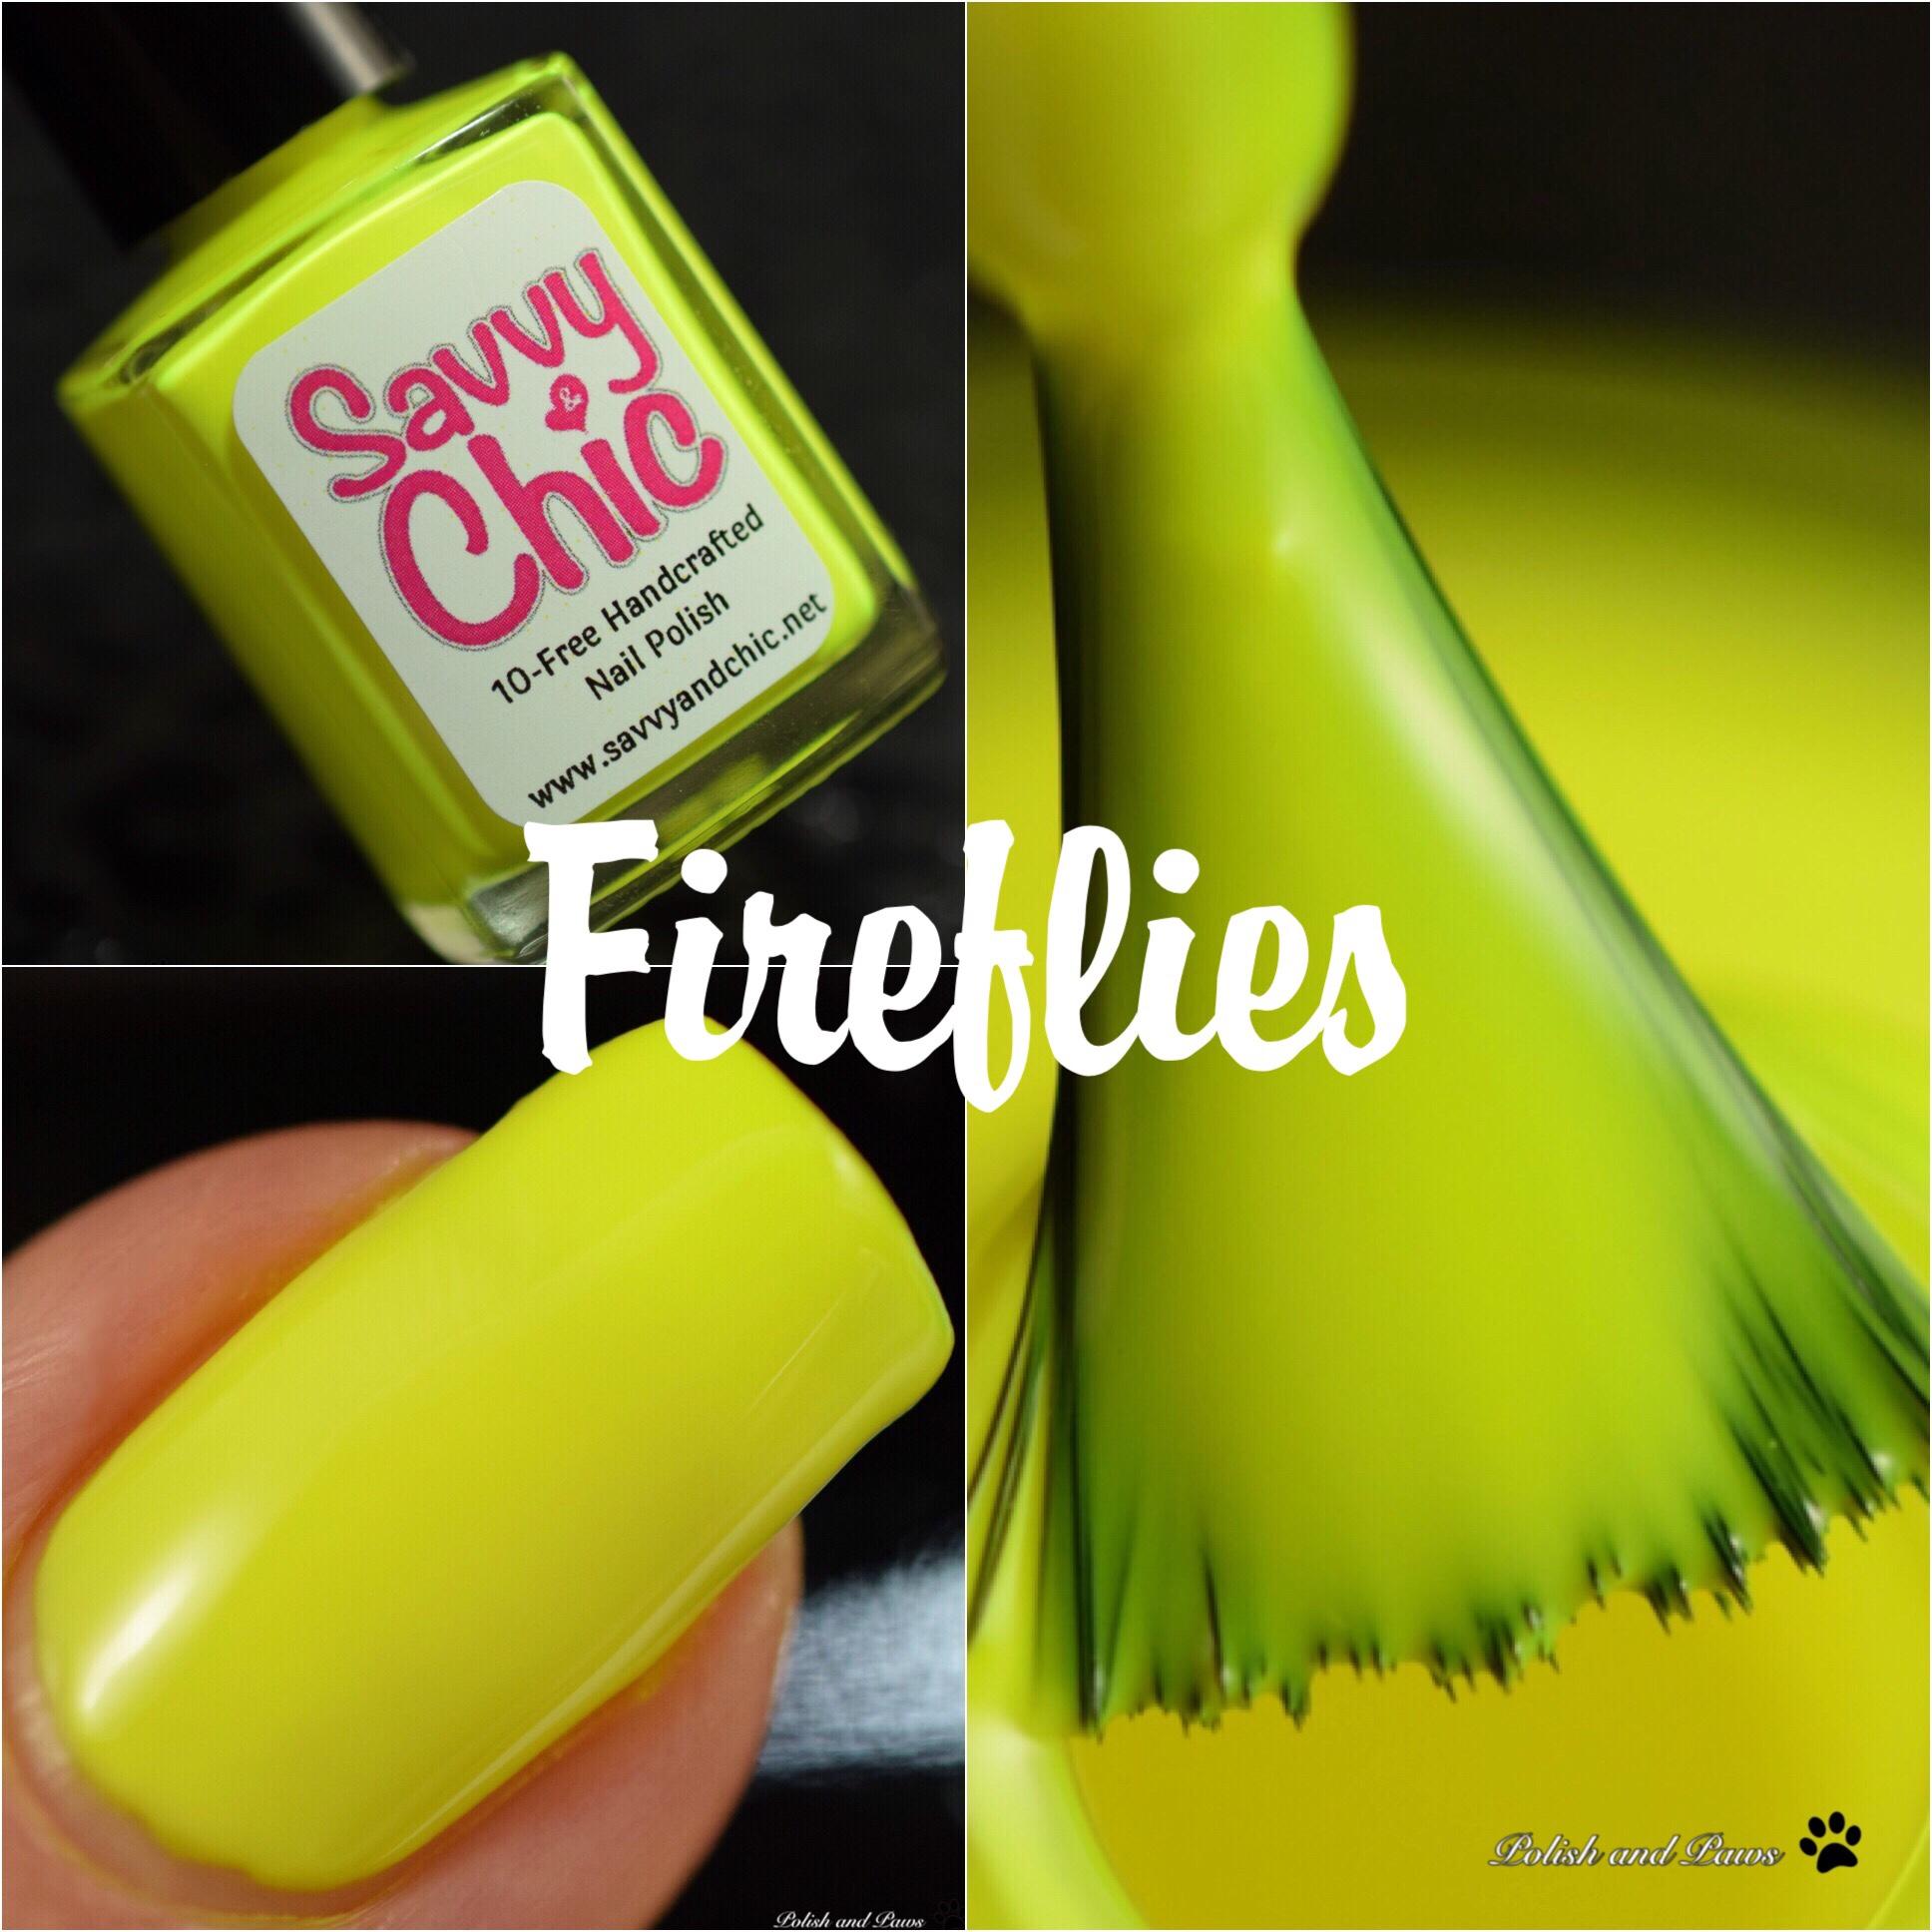 Savvy & Chic Fireflies